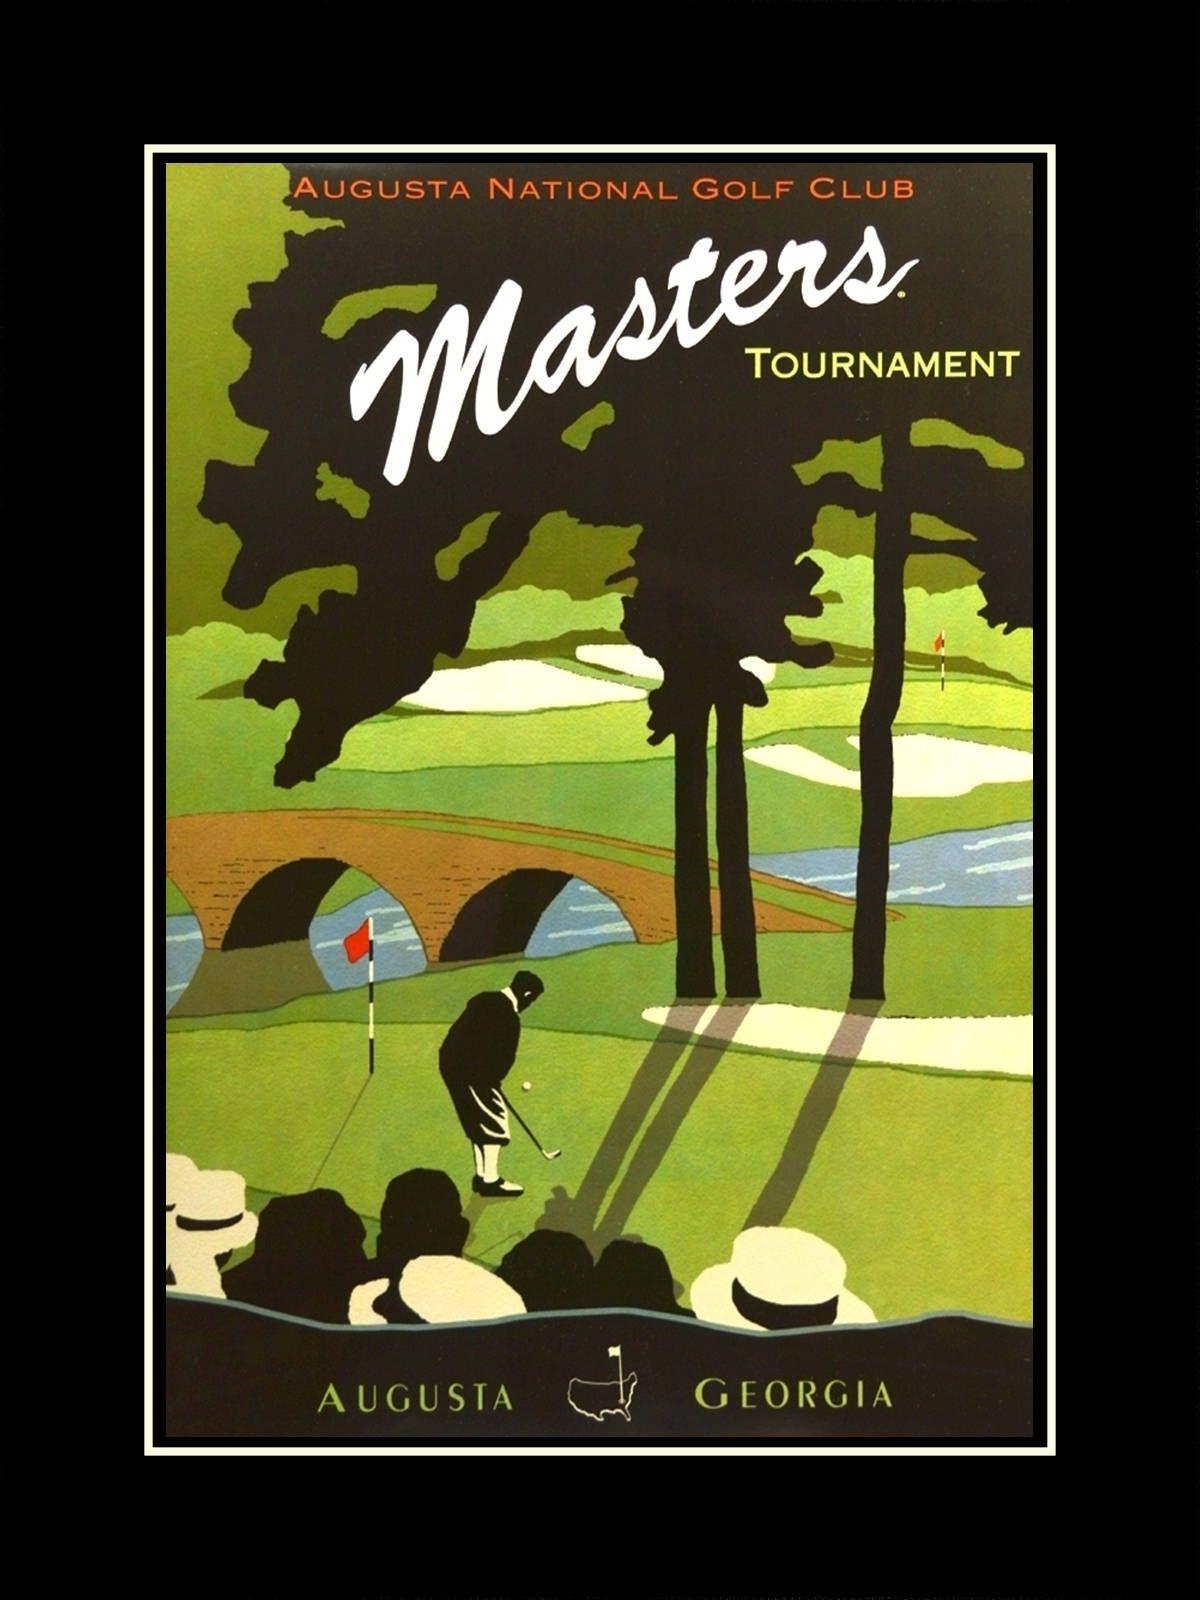 Vintage Golf Illustration Wall Art Poster Mens Drawing Art Print Office Gift Augusta National Wall Decor In 2020 Illustration Wall Art Golf Art Illustration Wall